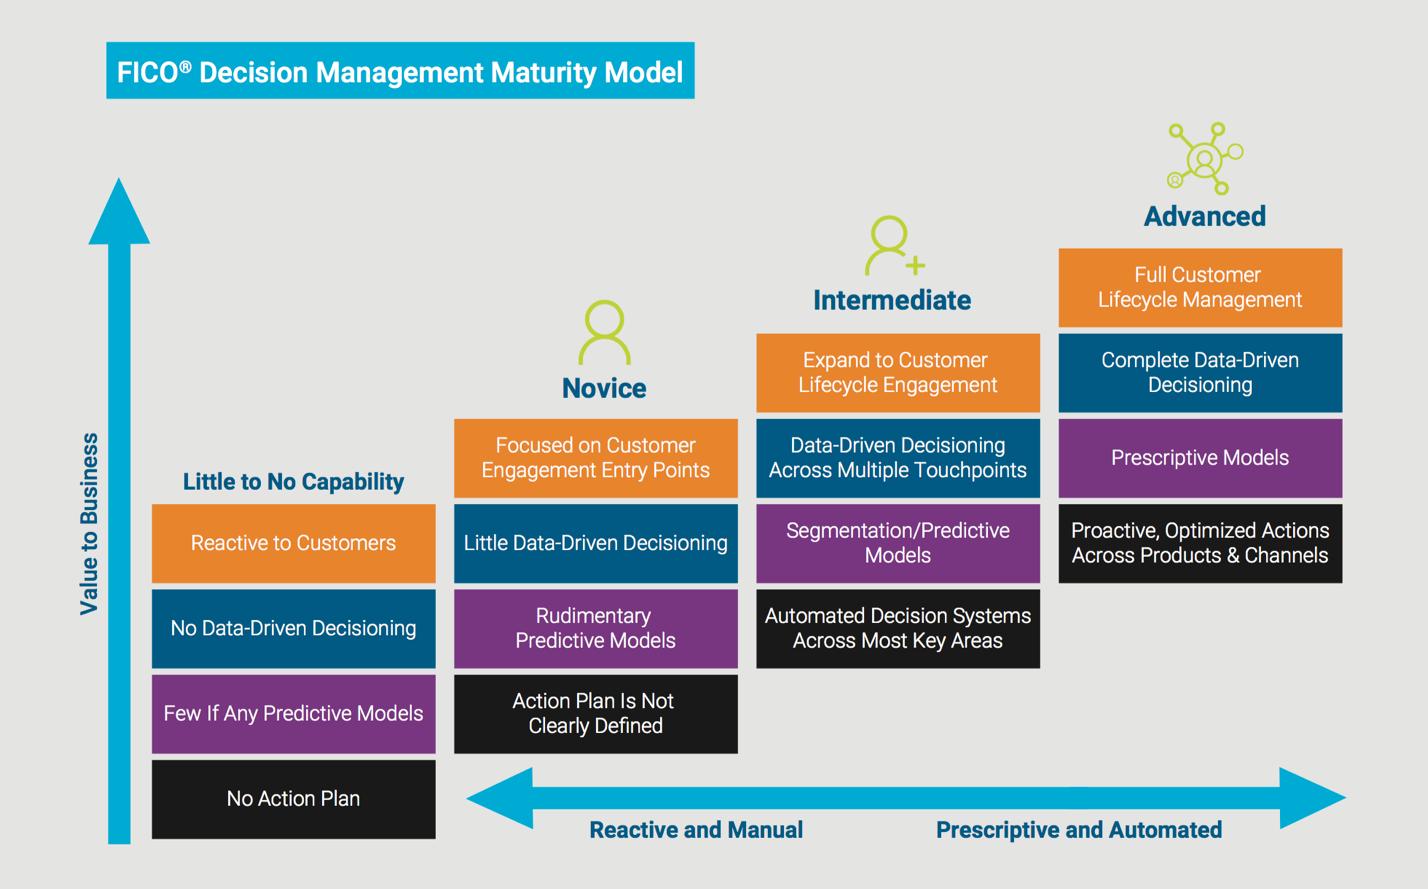 FICO Decision Management Maturity Map